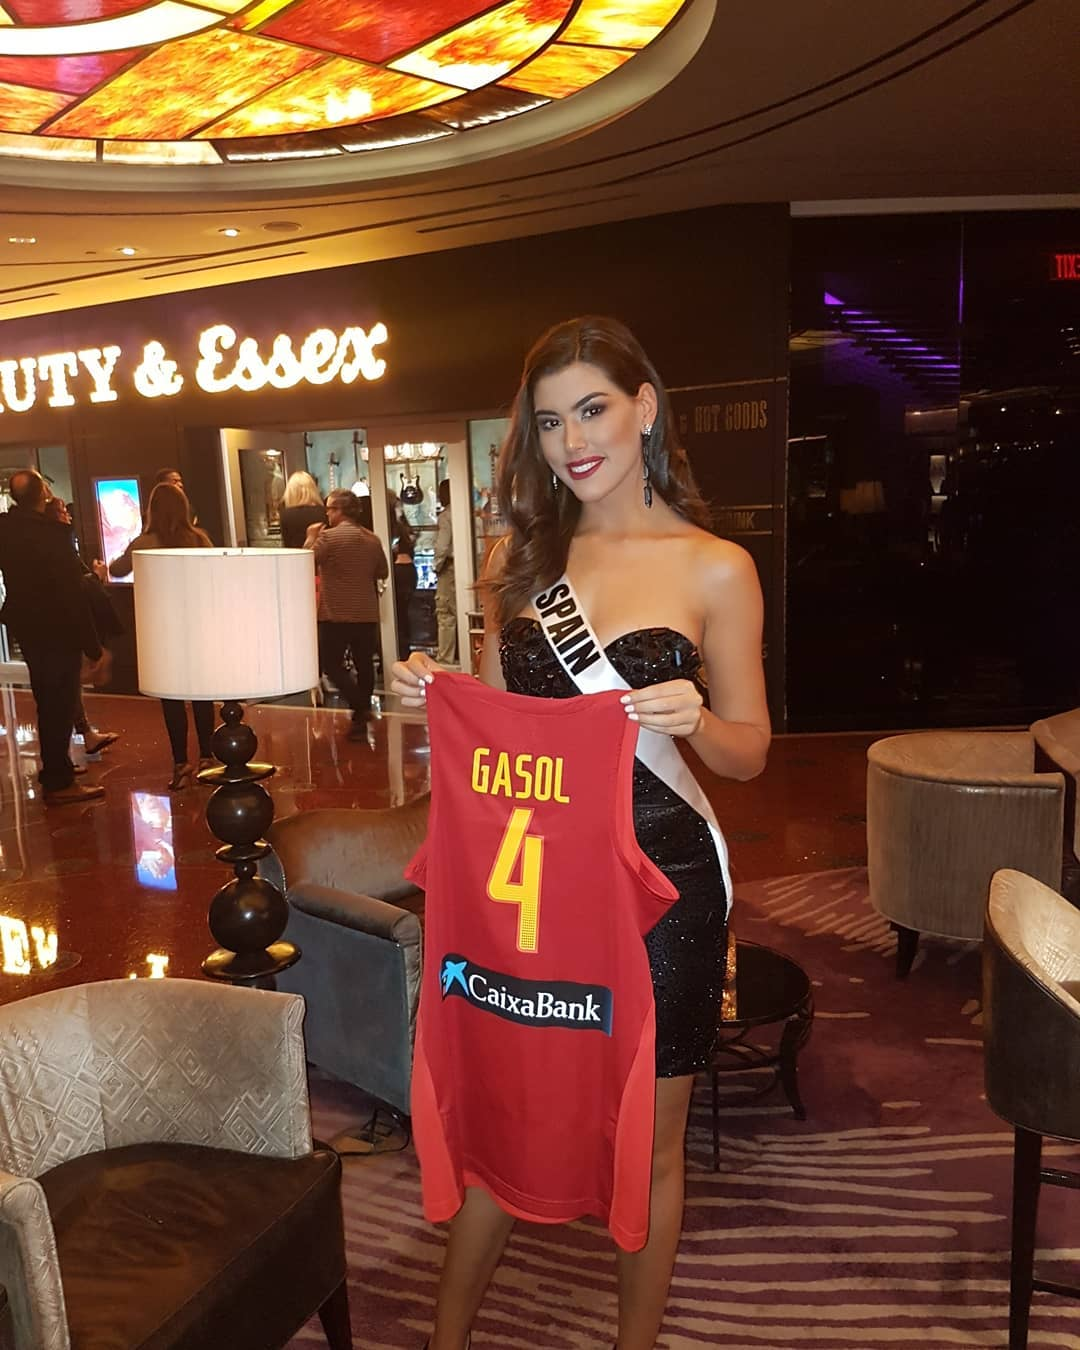 sofia del prado, reyna hispanoamericana 2015, top 10 de miss universe 2017. - Página 13 23967012